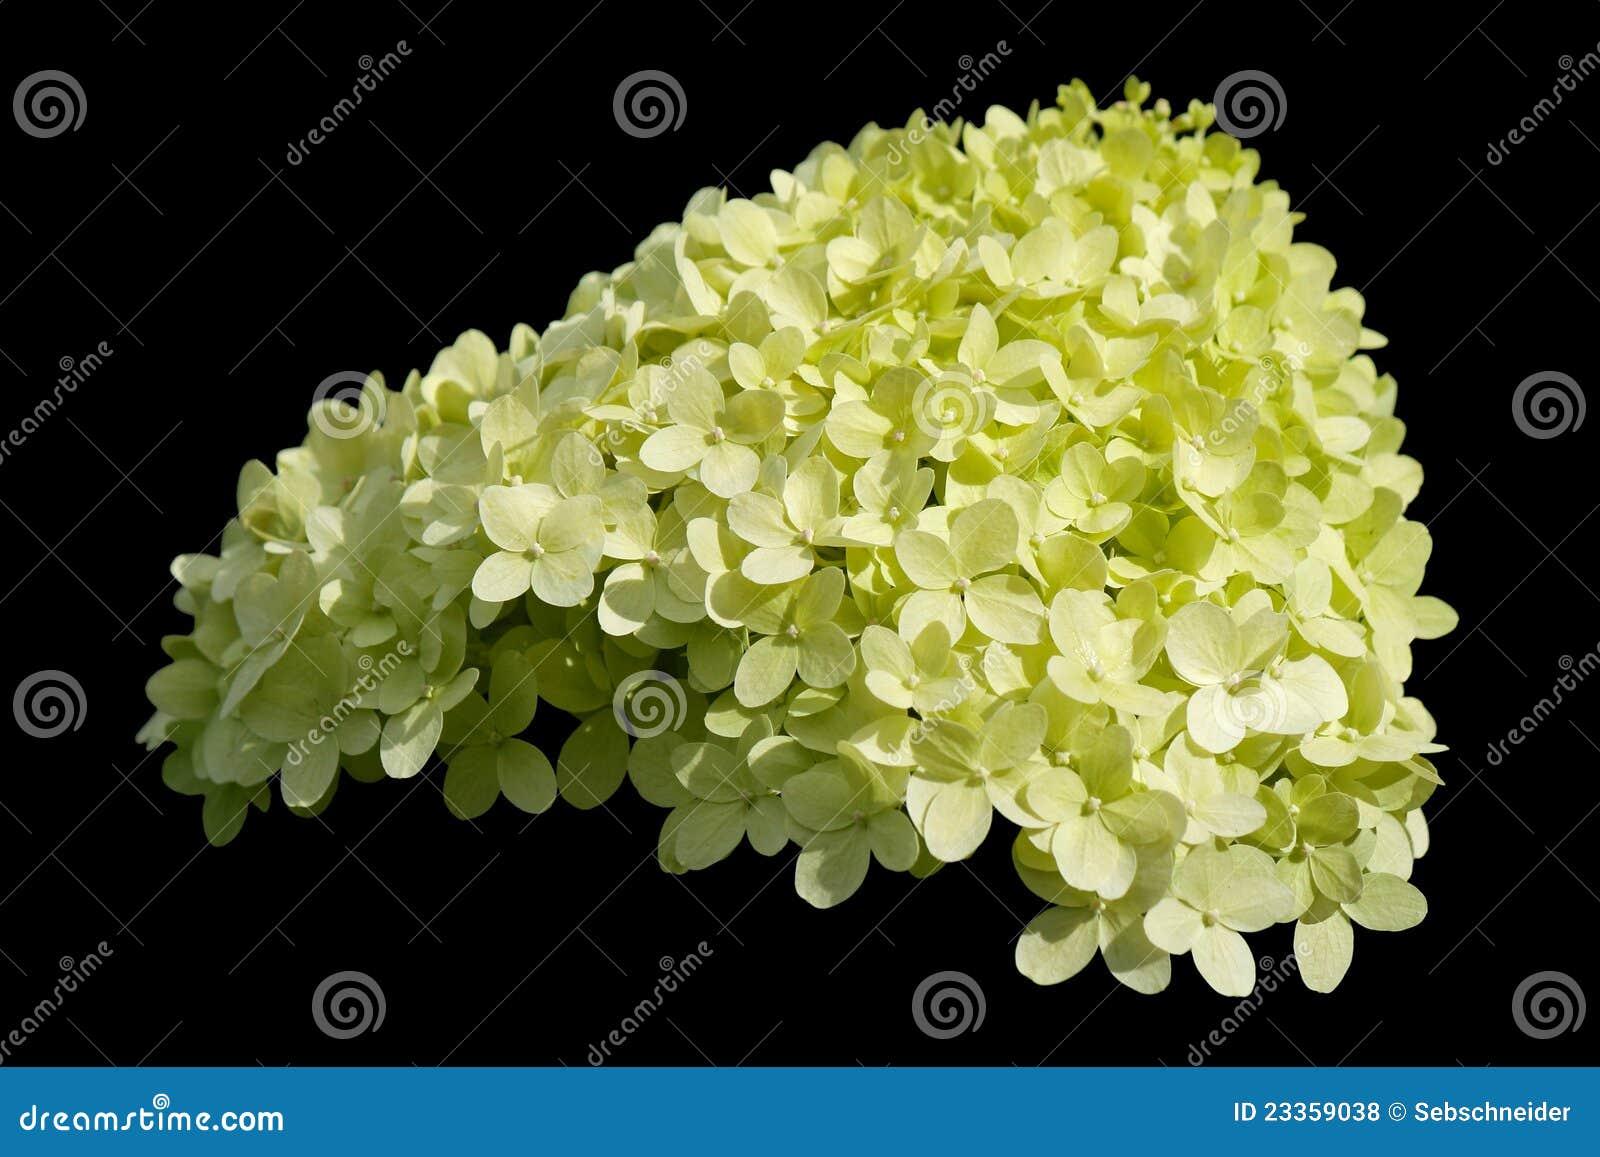 hydrangea arborescens annabelle royalty free stock photos image 23359038. Black Bedroom Furniture Sets. Home Design Ideas